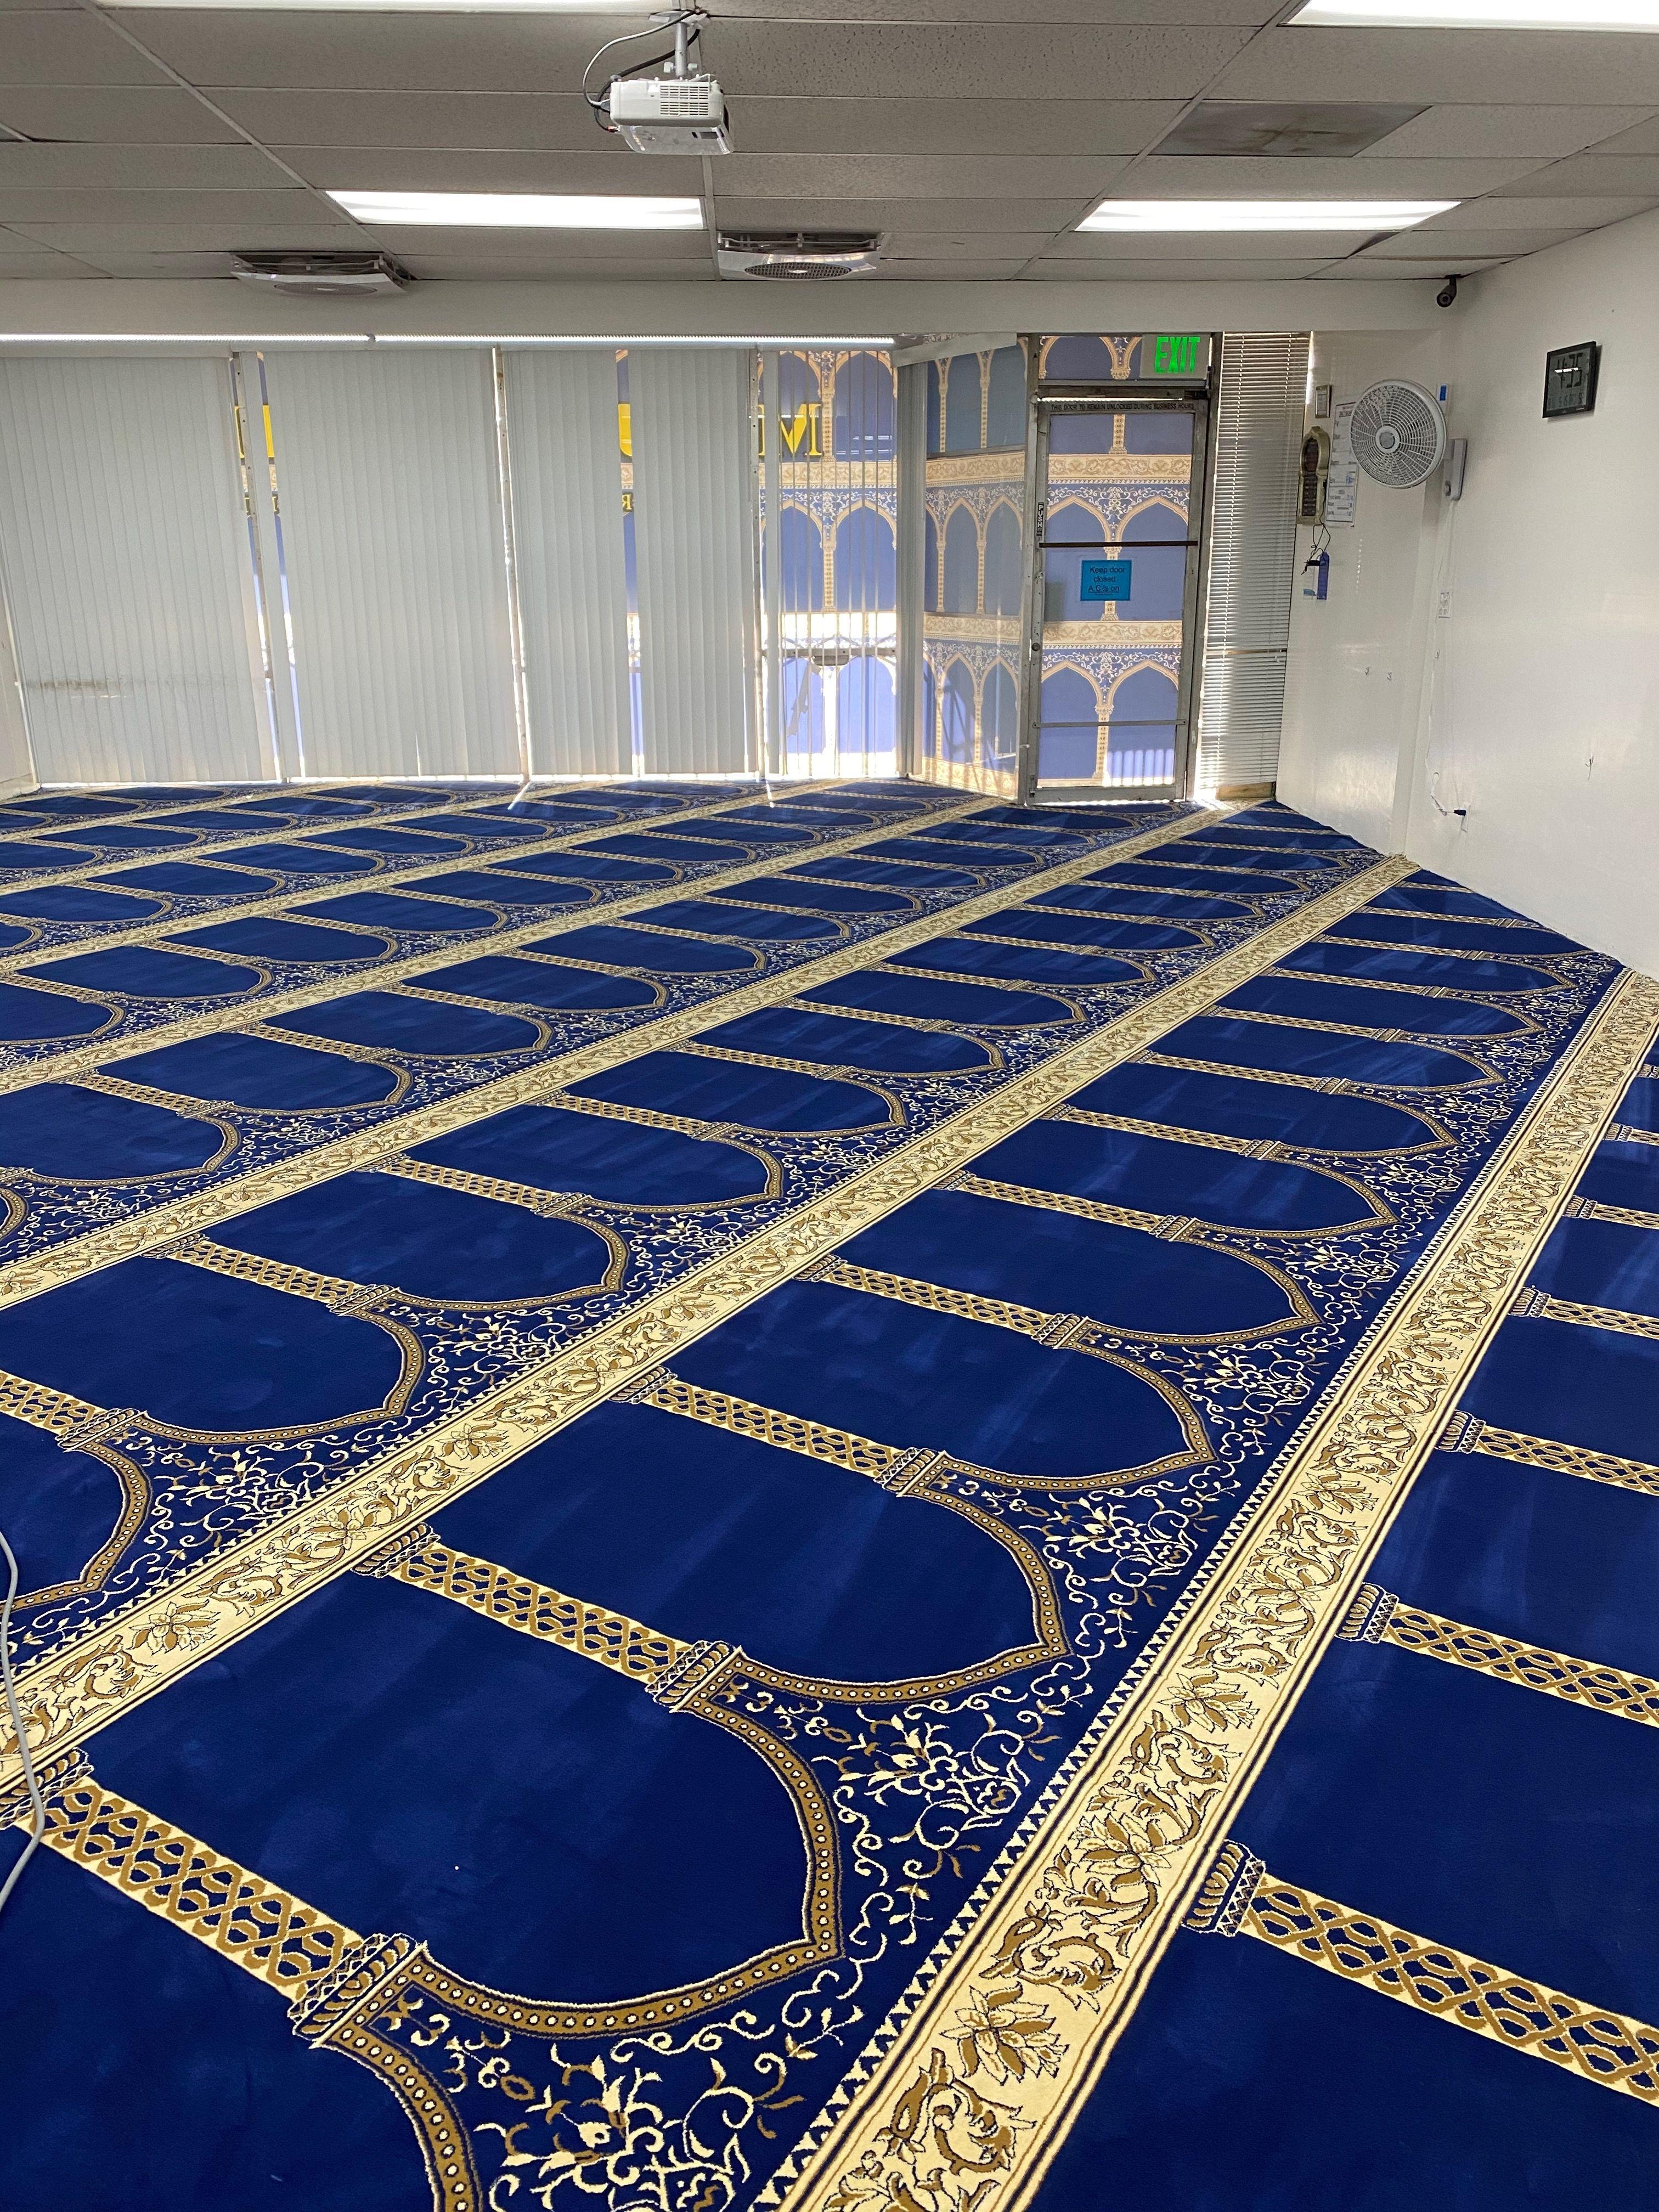 1 masjid carpet suppleir in usa